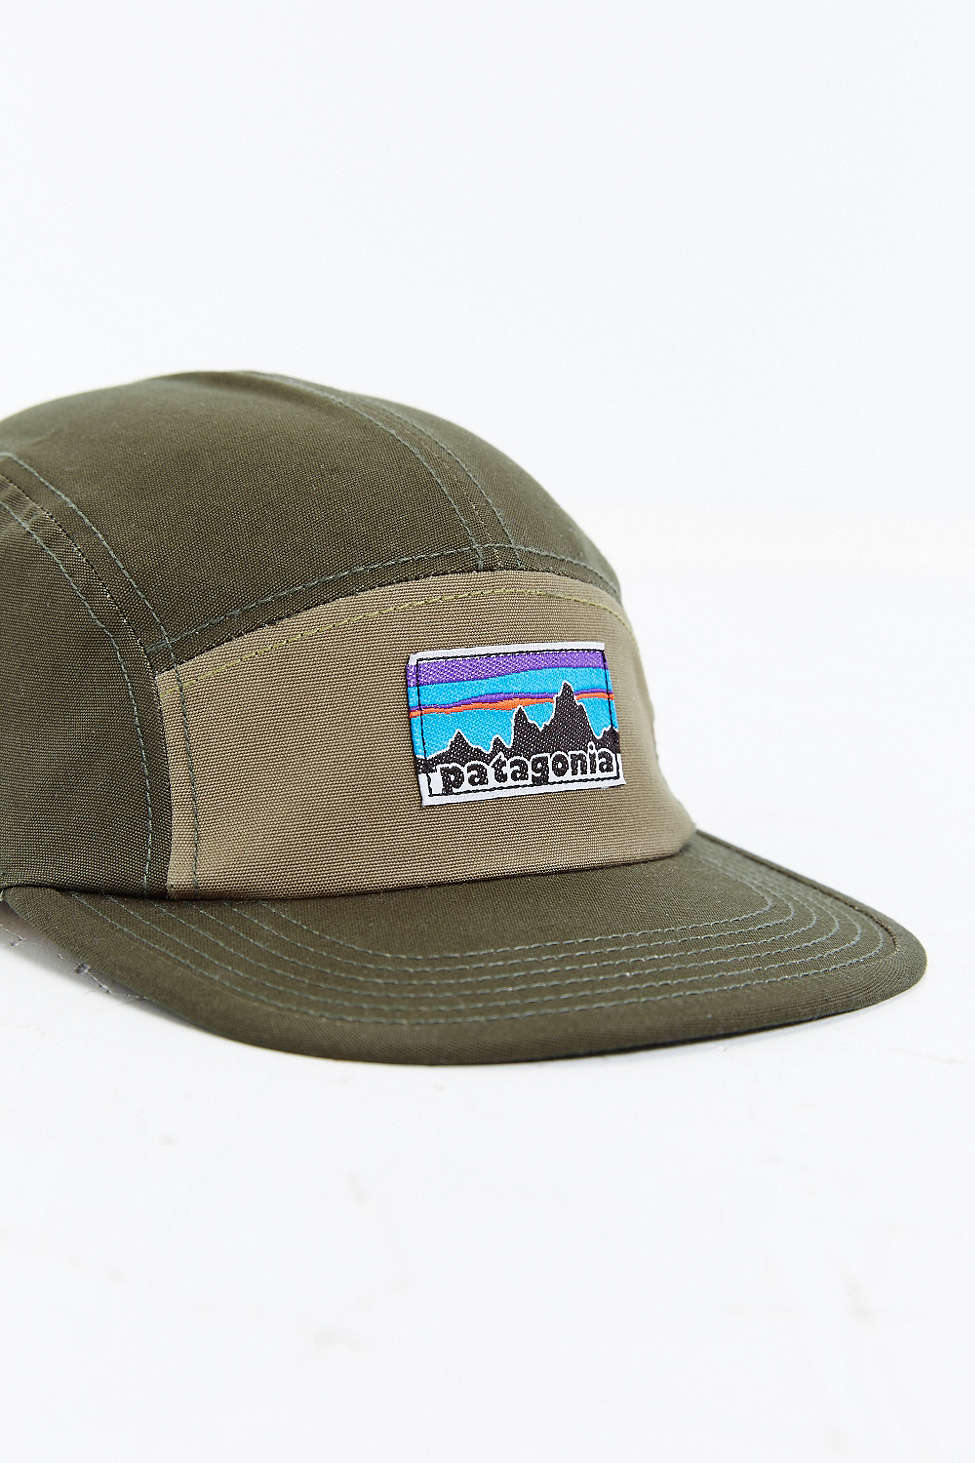 Patagonia Retro Fitz Roy Label 5 Panel Baseball Hat For